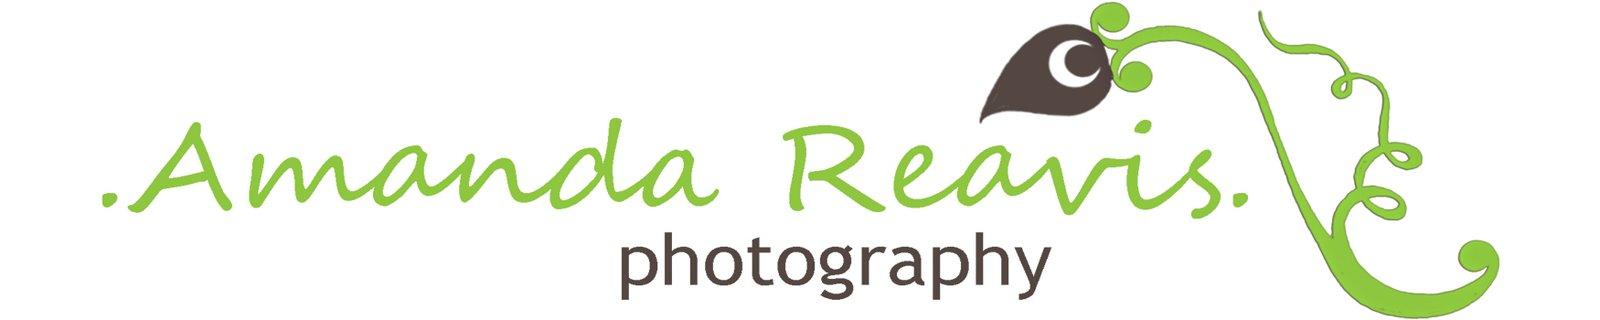 Amanda Reavis Photography